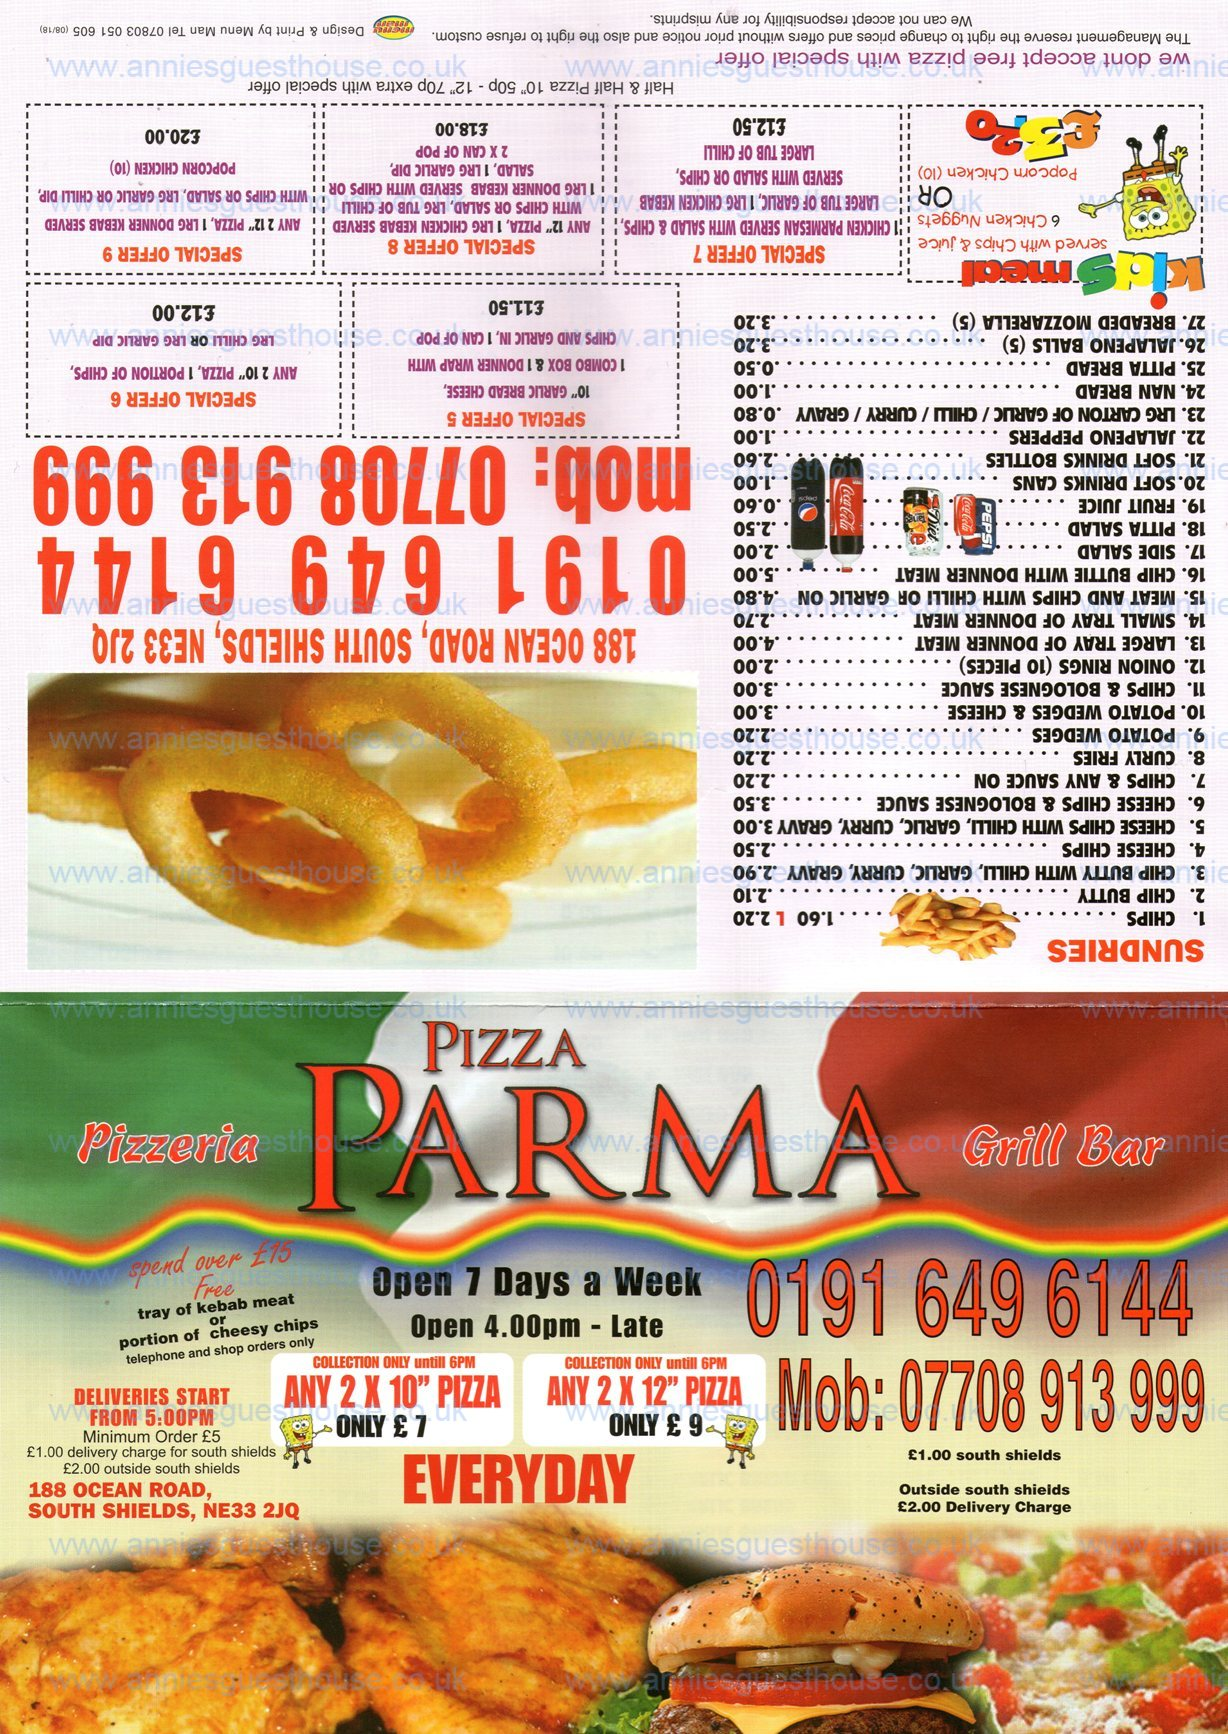 Pizza Parma 188 Ocean Road South Shields NE33 2JQ Menu 1